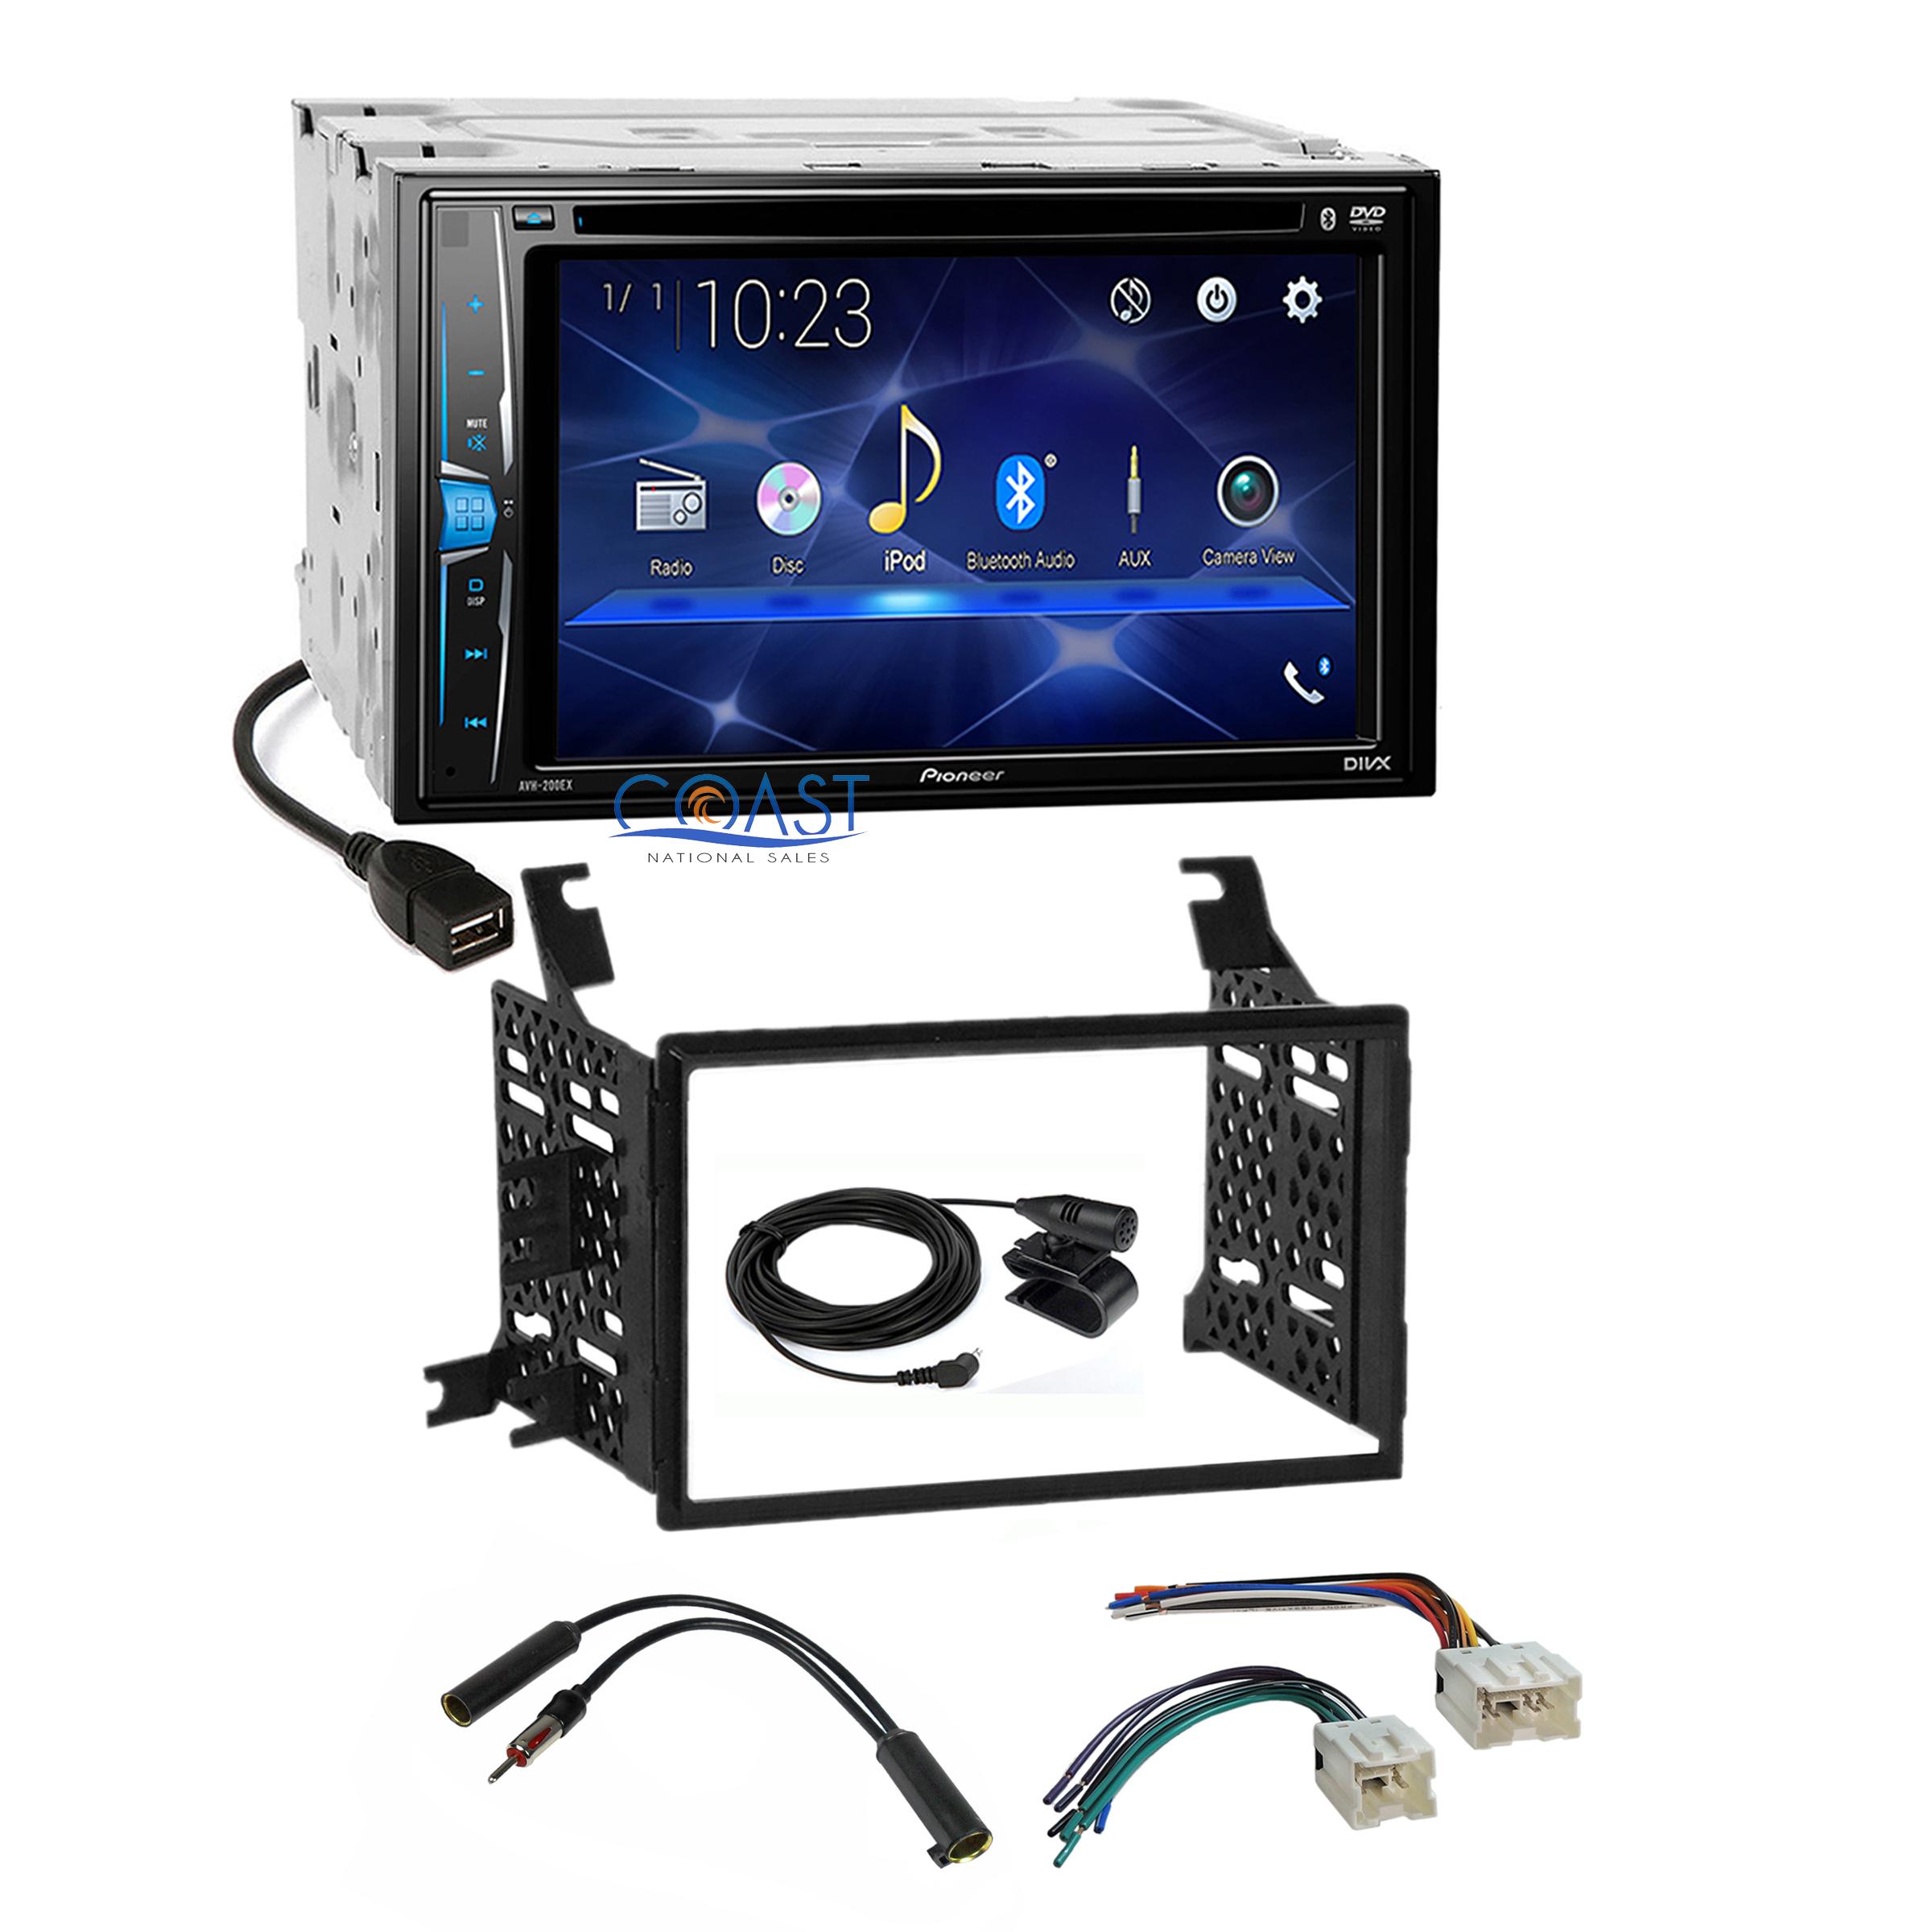 Pioneer Dvd Bluetooth Stereo Dash Kit Harness For 05 Nissan Pathfinder Wiring Xterra